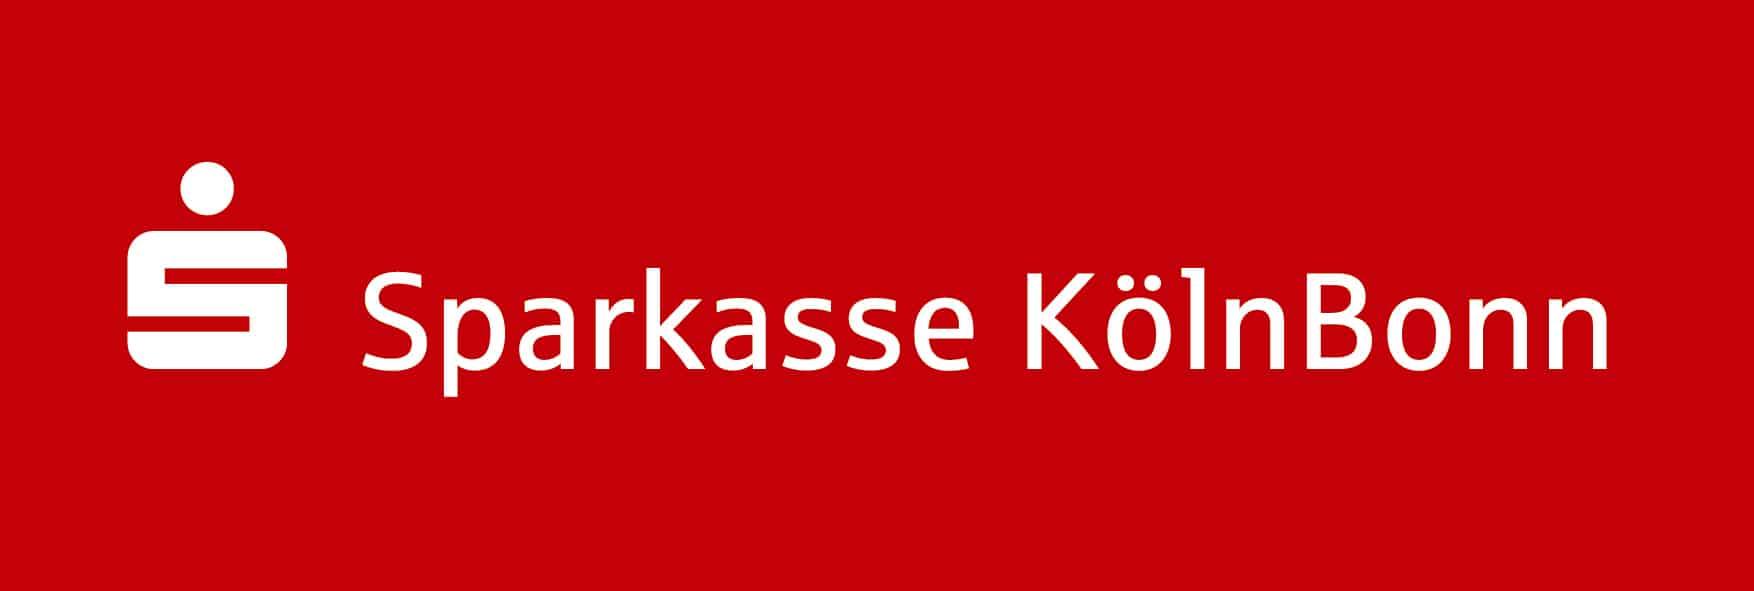 Www Sparkasse Köln Bonn